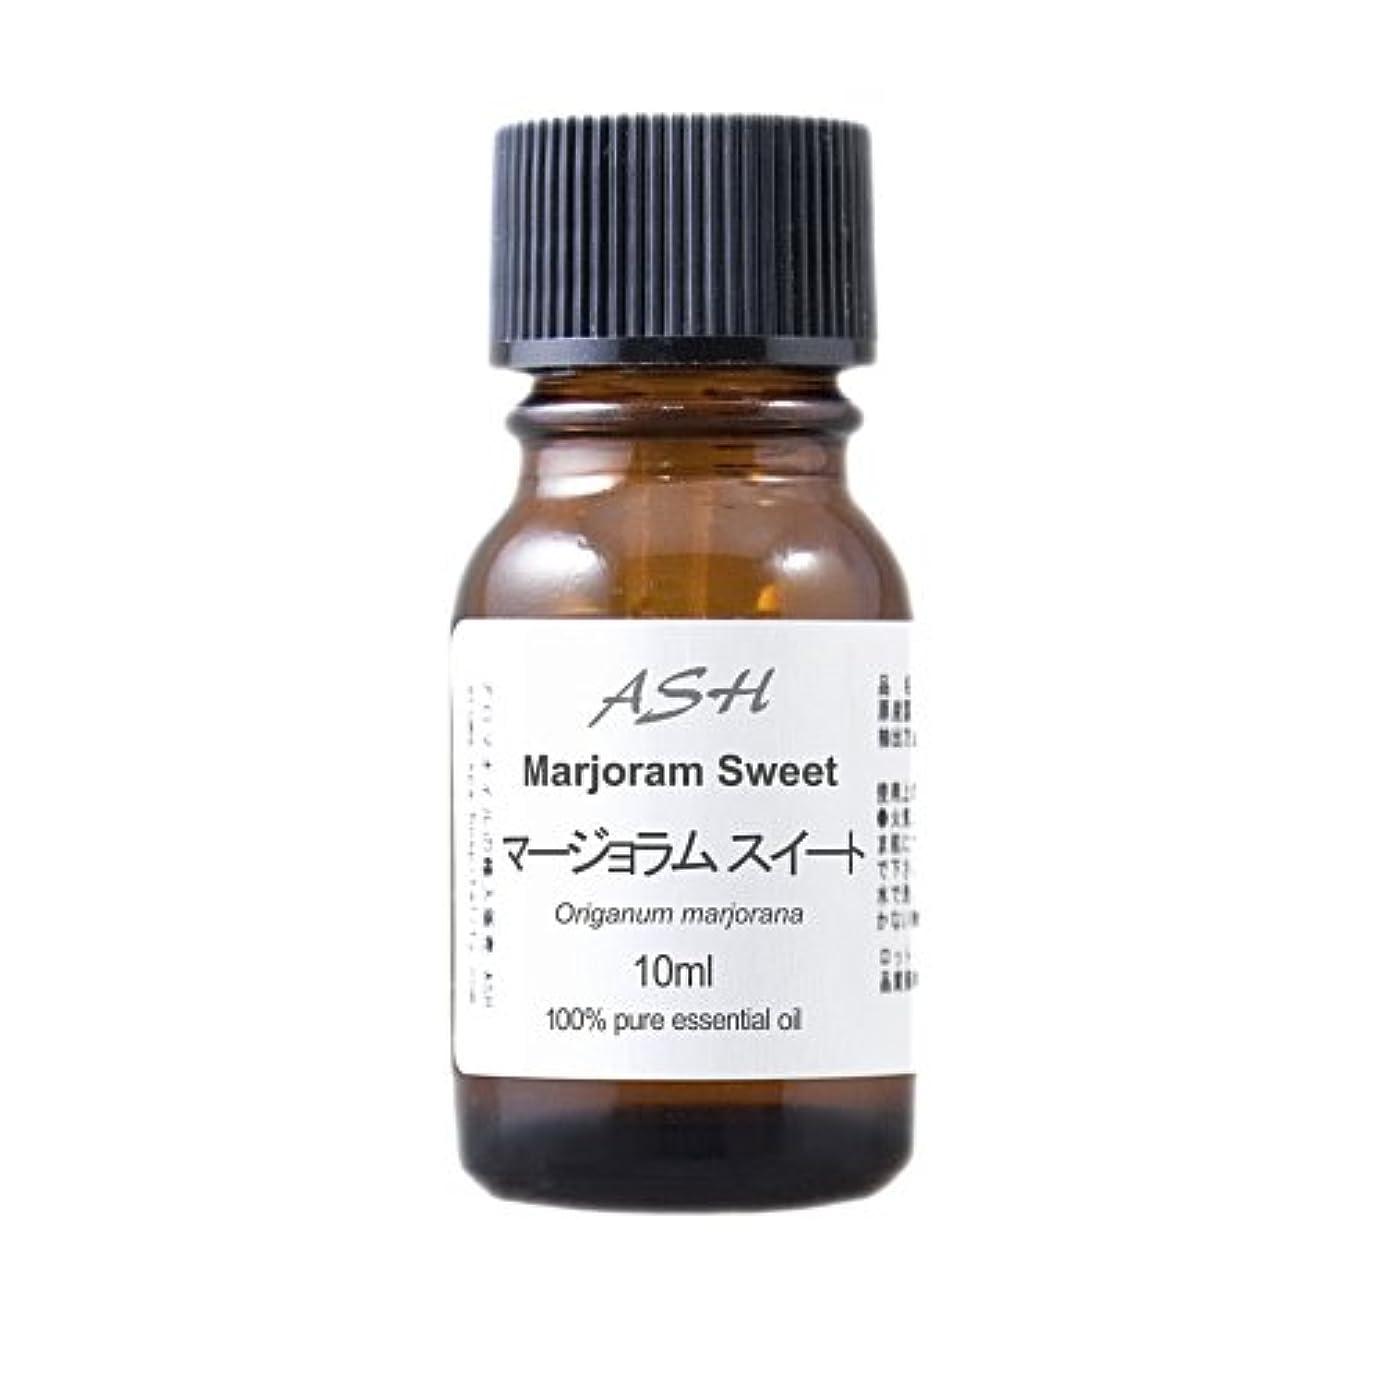 ASH マージョラムスイート エッセンシャルオイル 10ml AEAJ表示基準適合認定精油